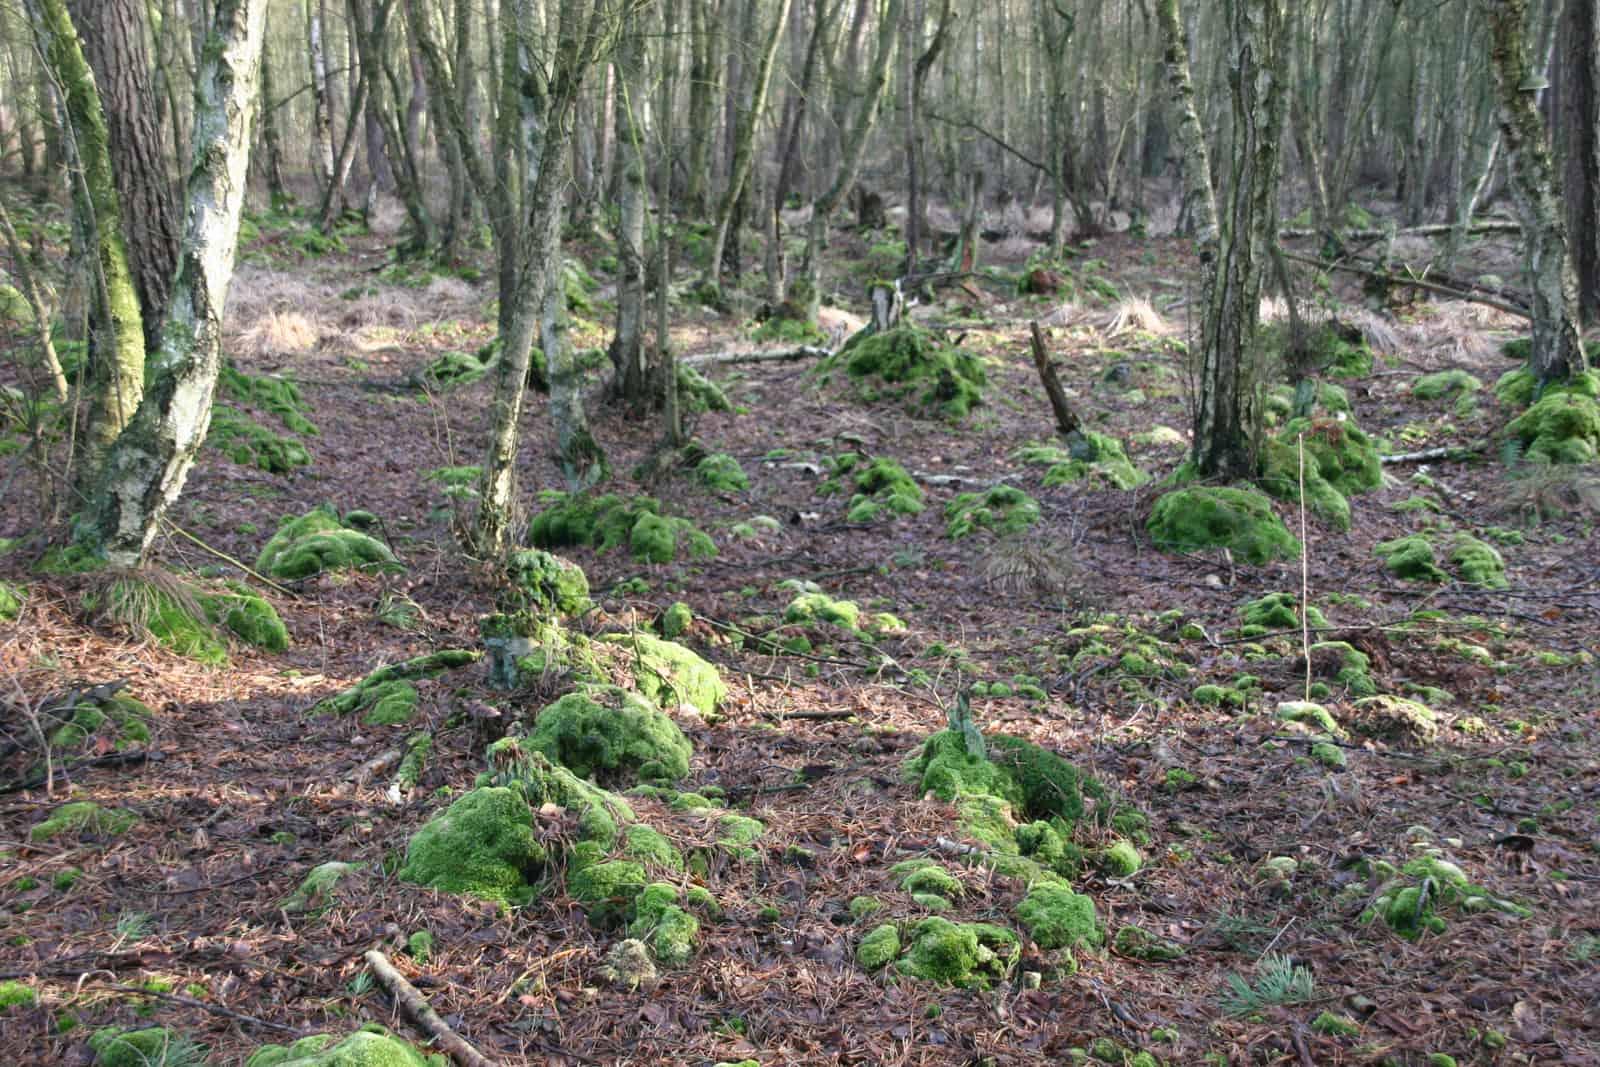 Trockenheit im Tessiner Moor. Foto: Gerd Schriefer